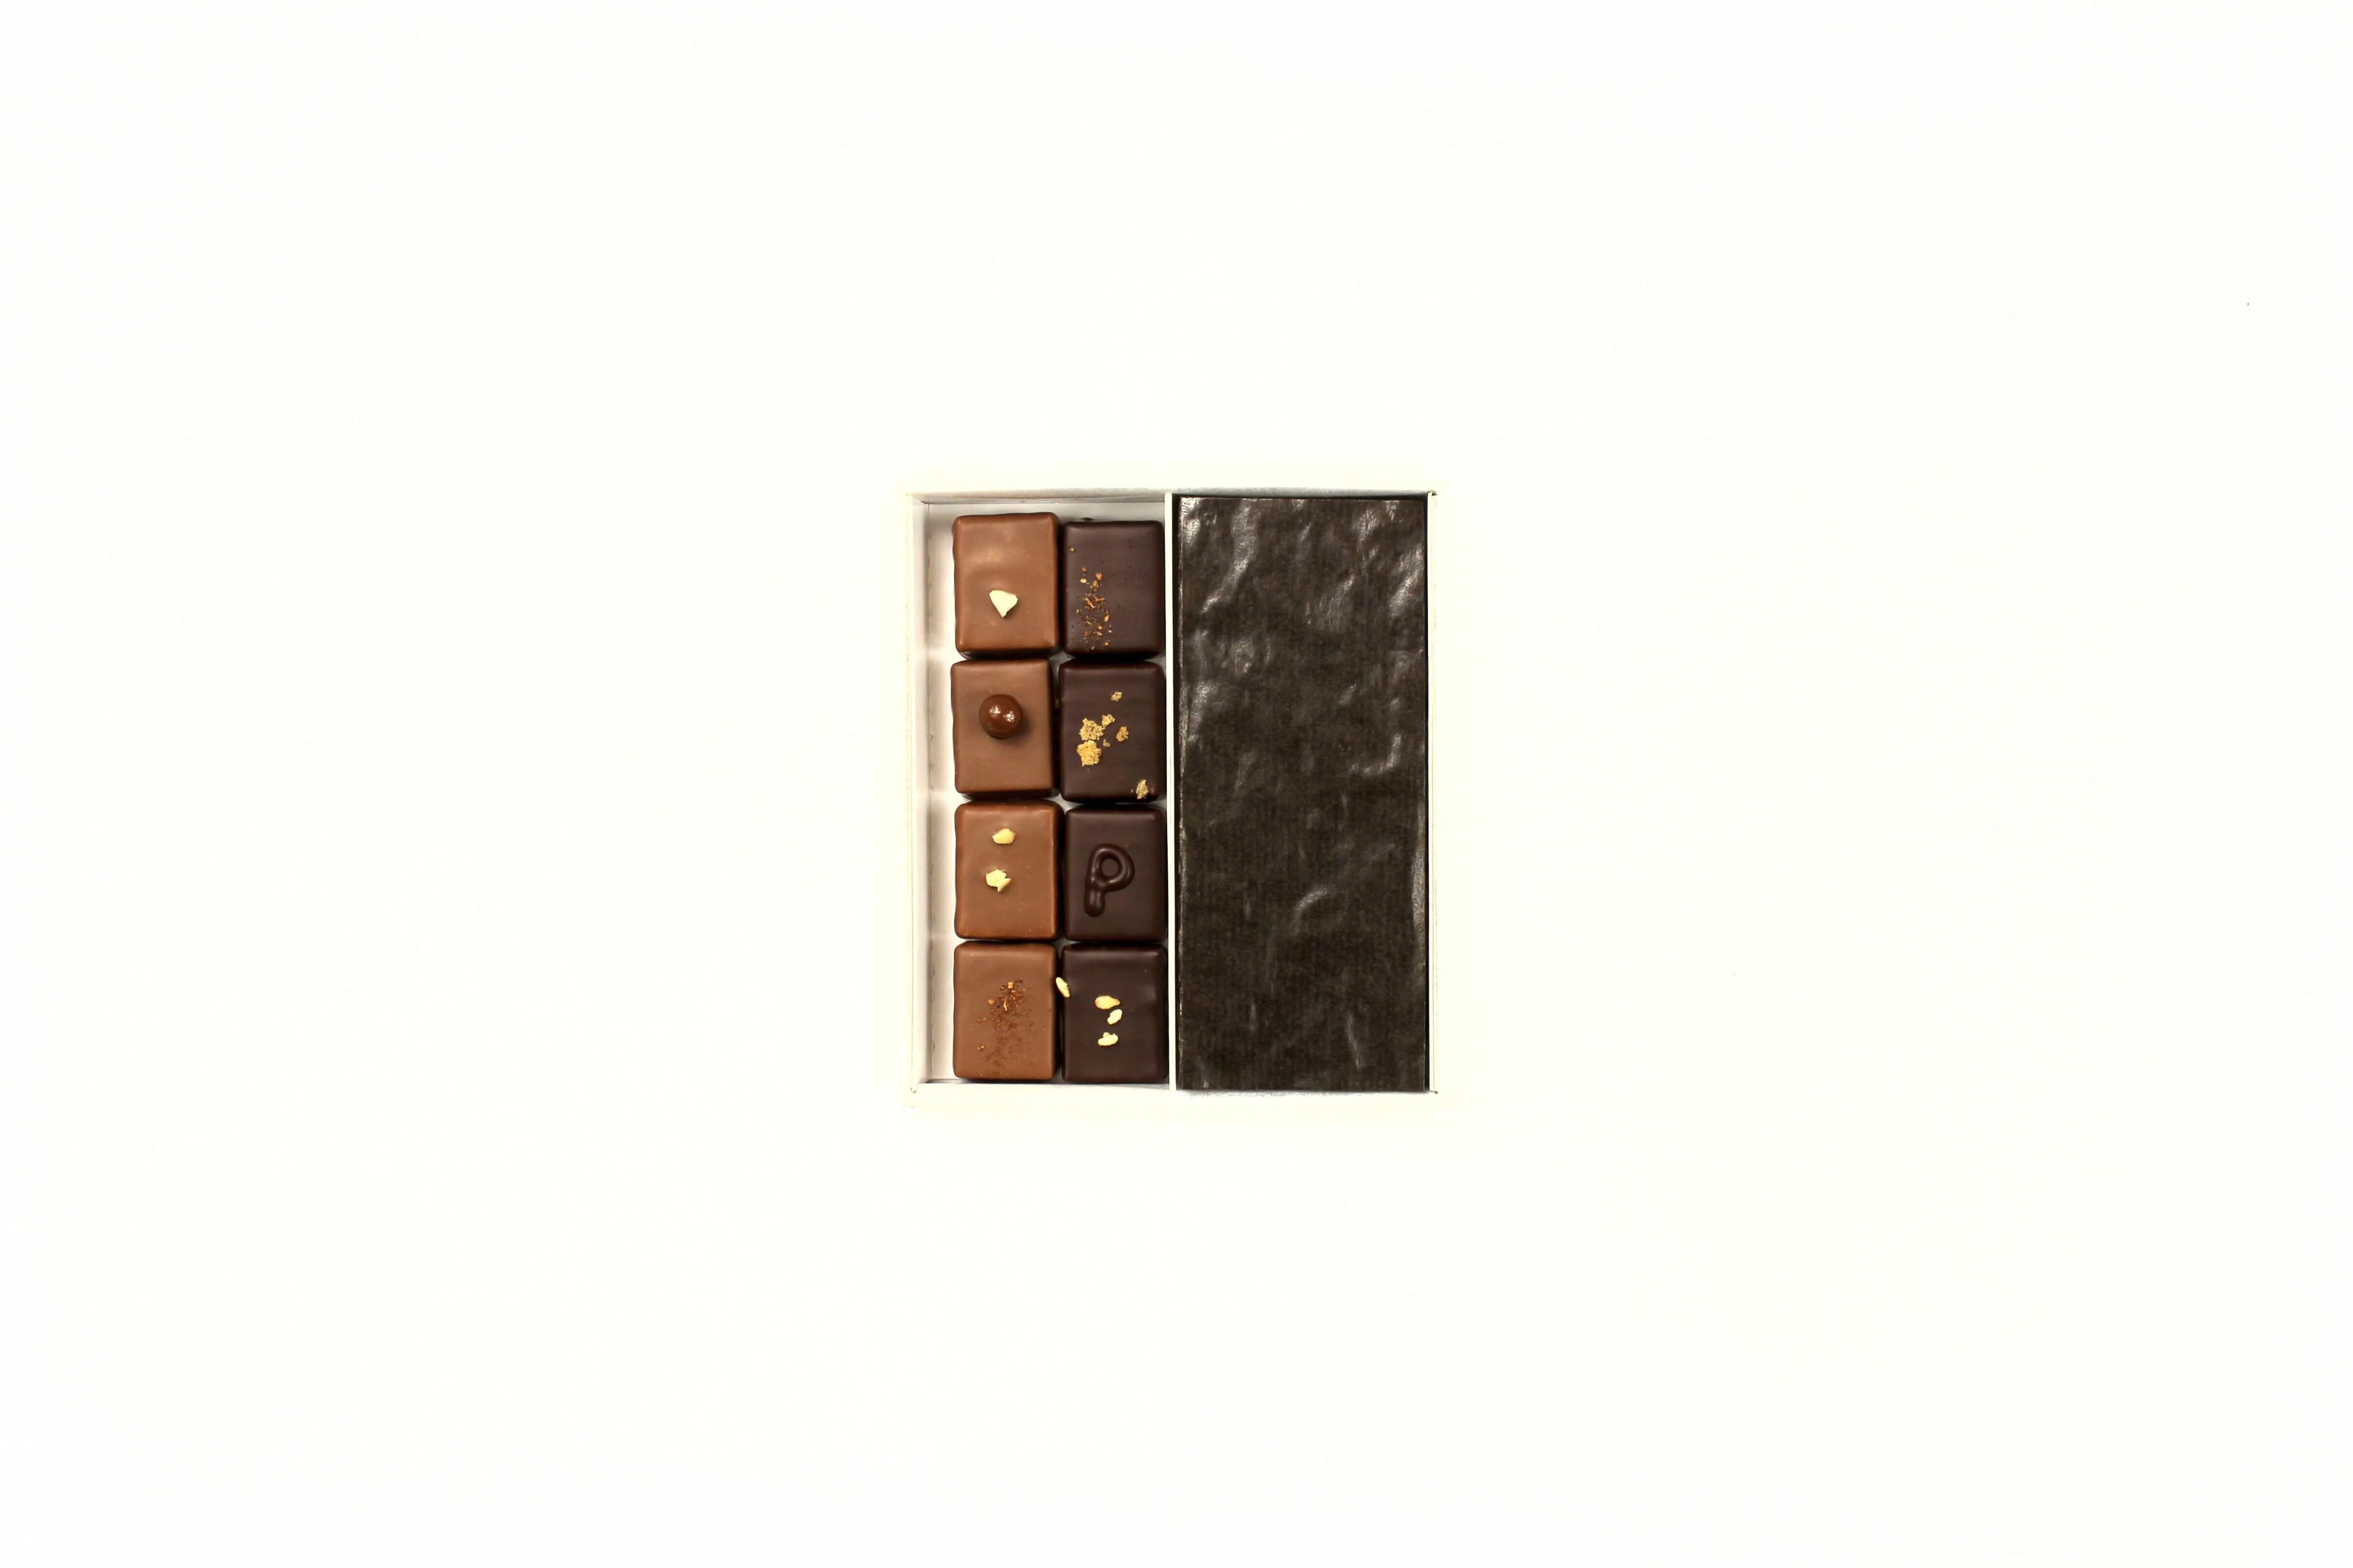 hilde devolder chocolatier box 15-16 with protection